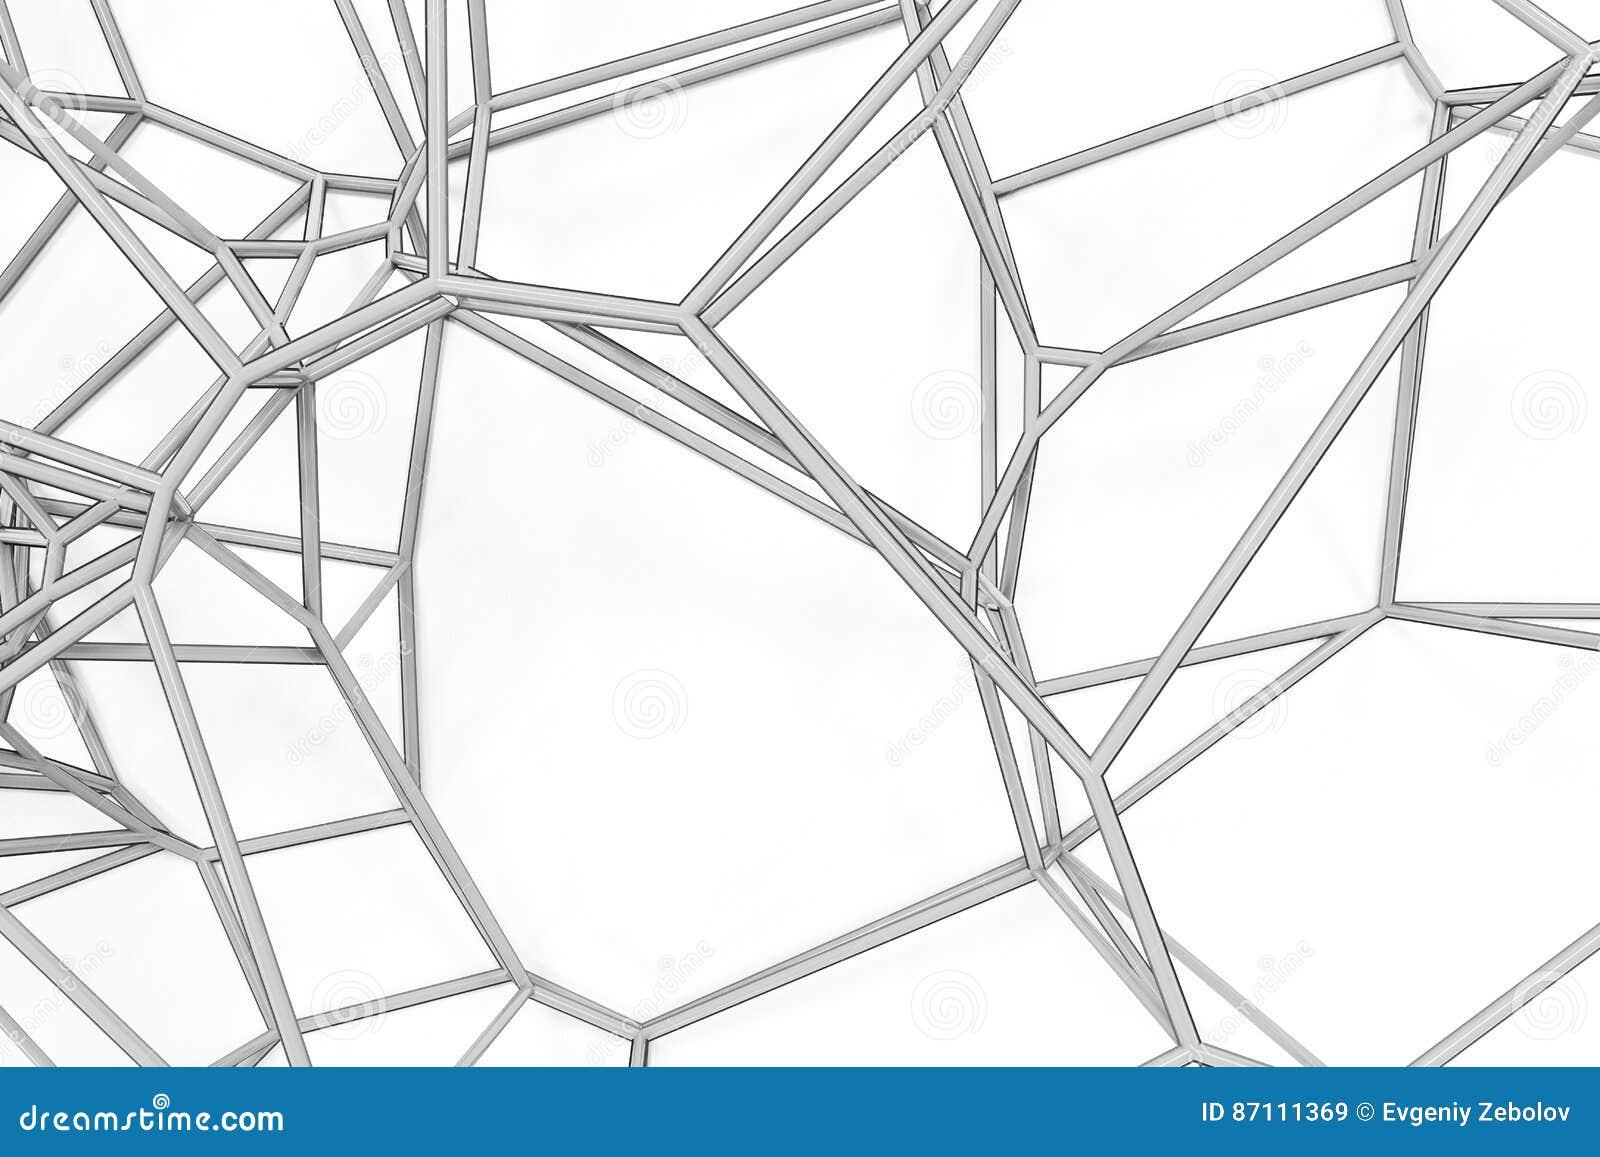 Abstrakcjonistyczna 3d voronoi kratownica na białym tle